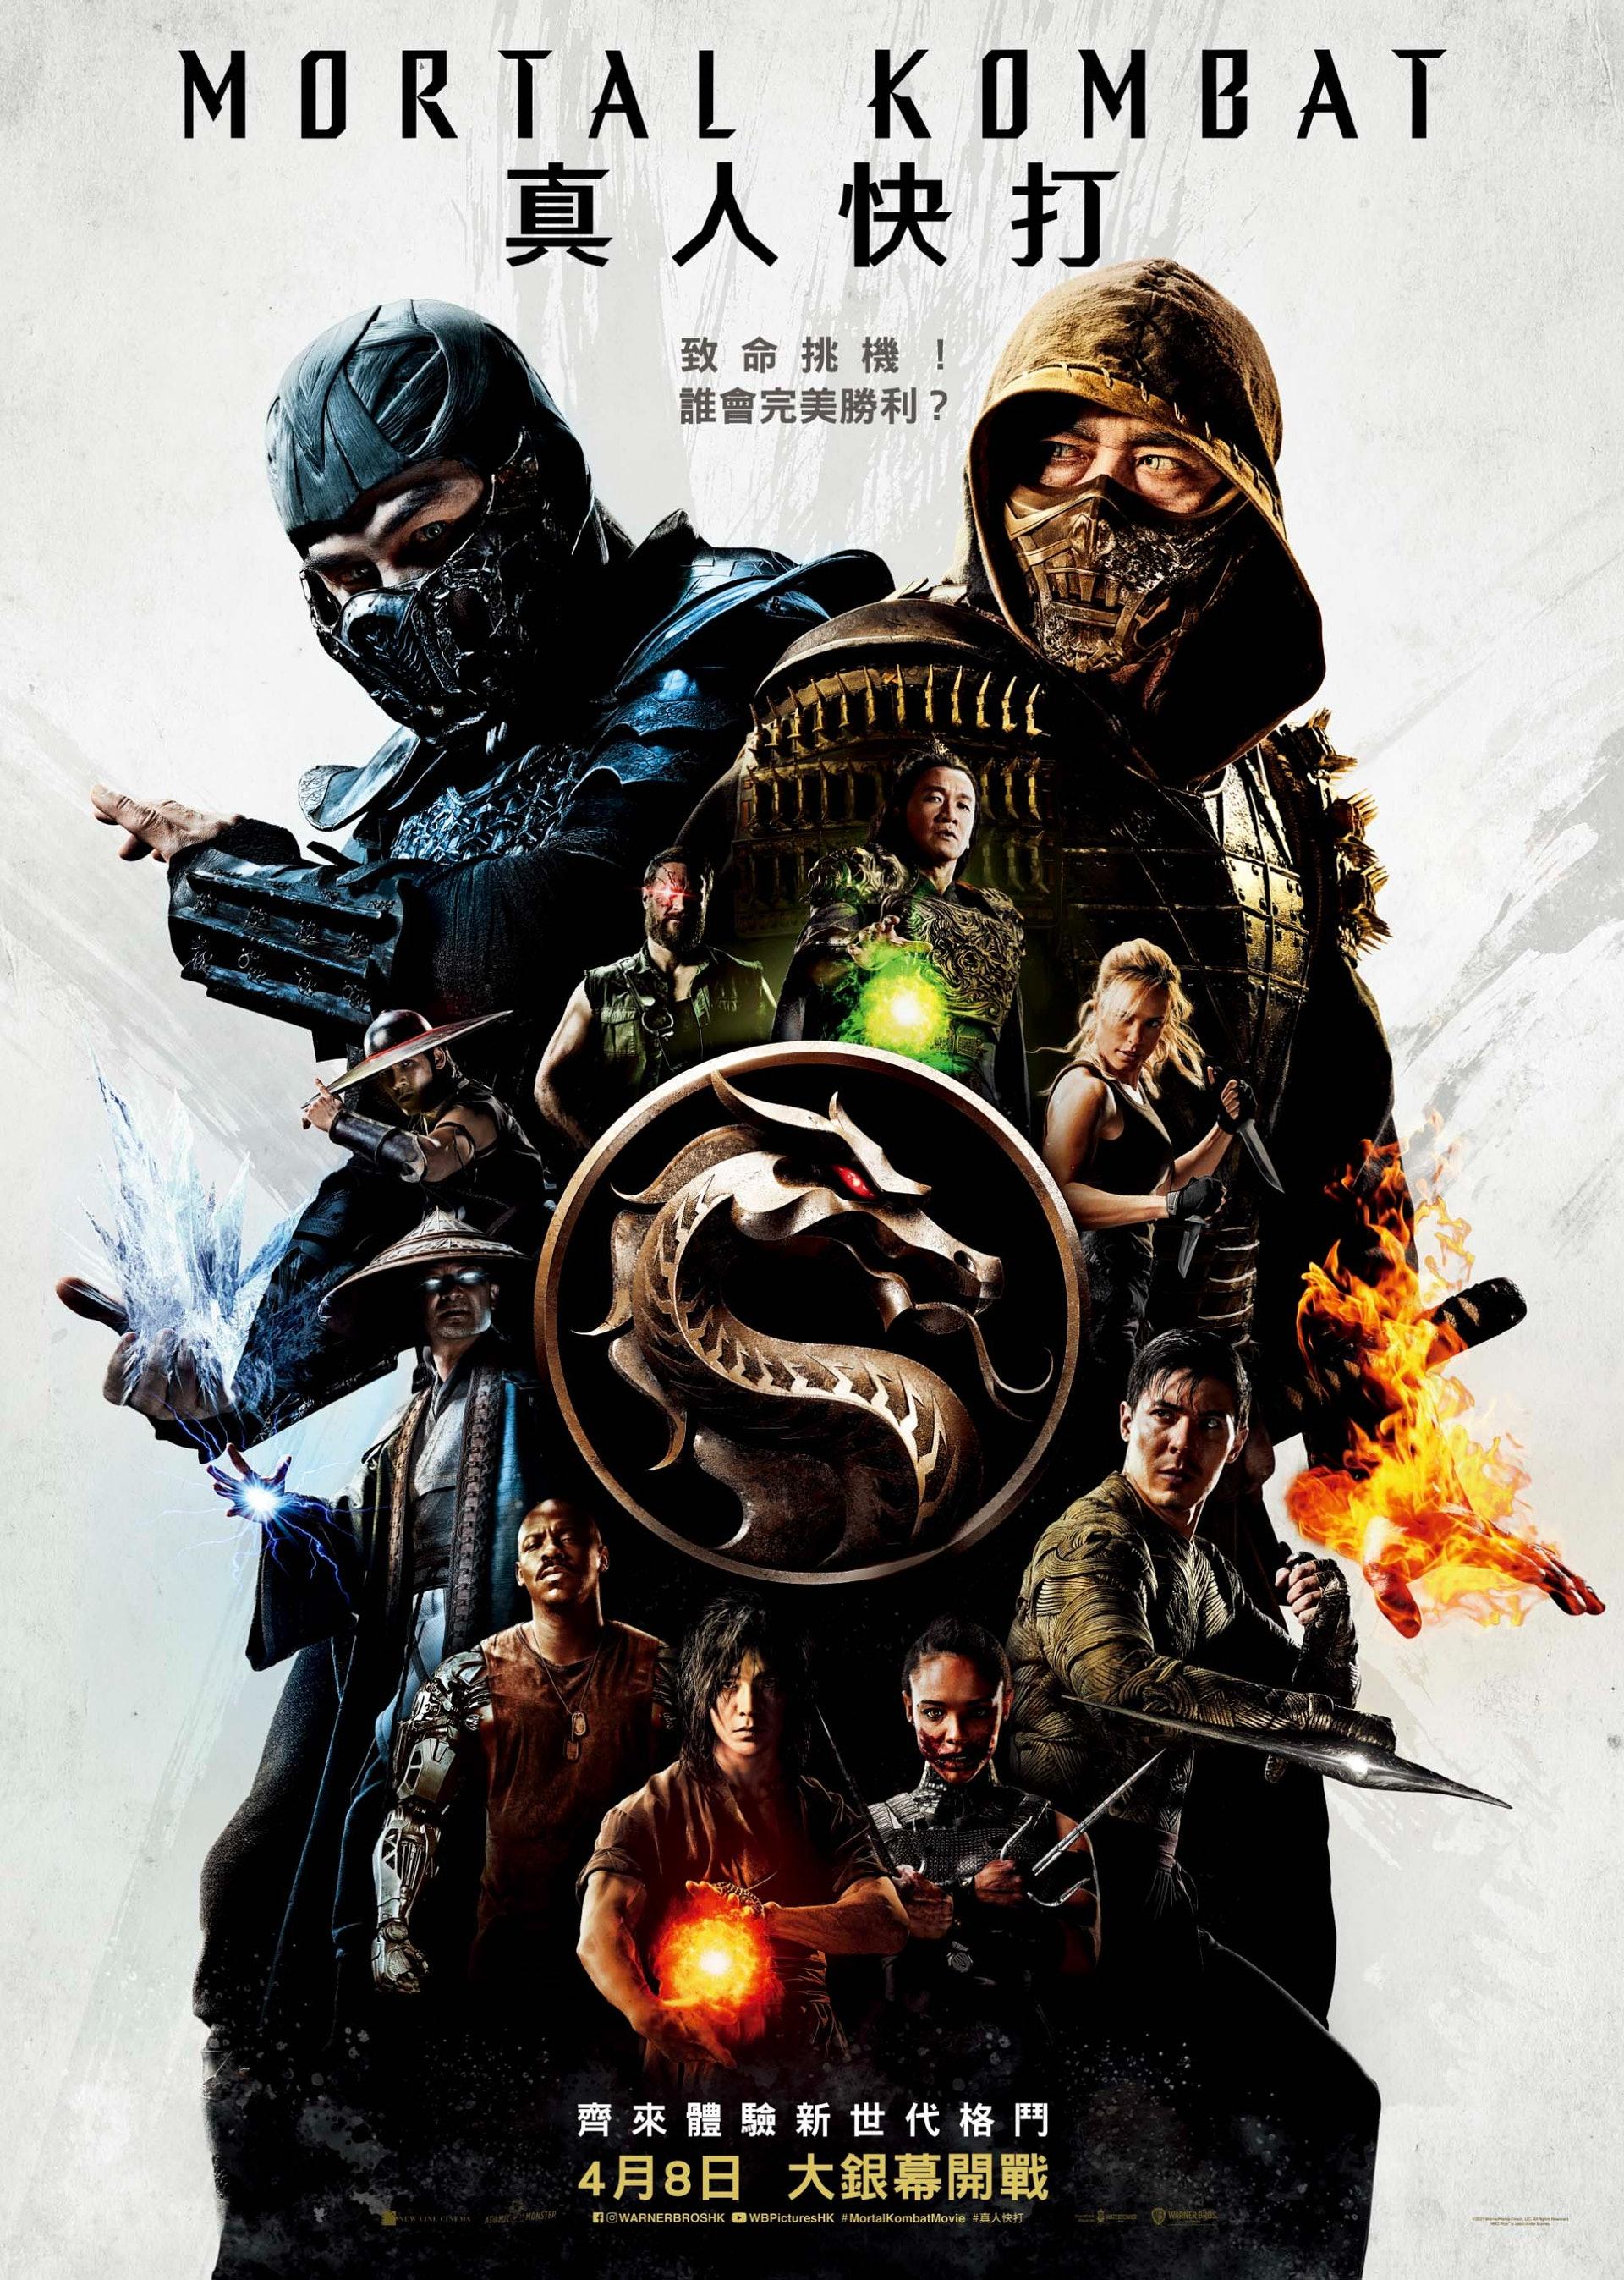 EP.101|超級血腥!格鬥遊戲《真人快打》巨幕登場!「魔蠍」、「絕對零度」 - 電影影評【Mortal Kombat】by就醬說